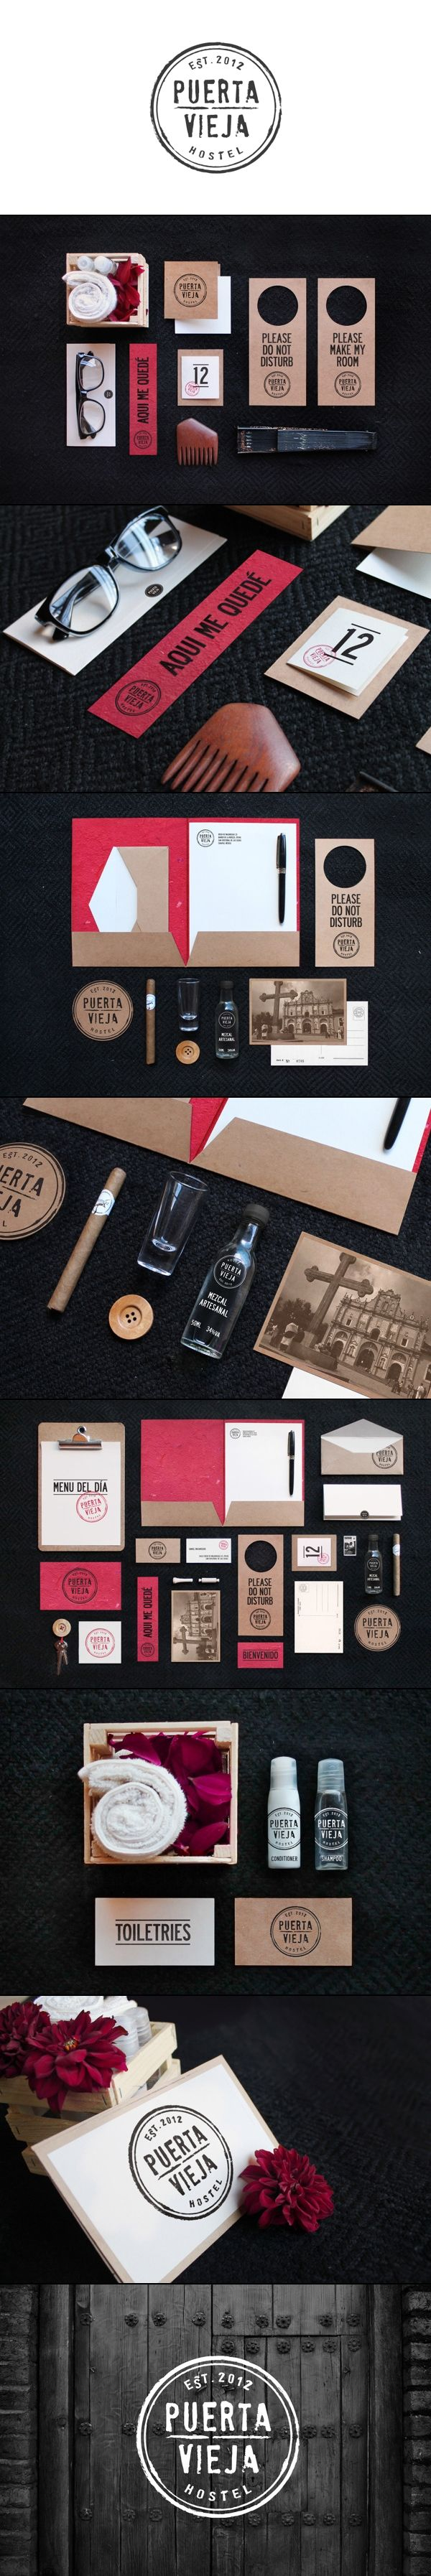 Graphic corporate design stationary business card | #stationary #corporate #design #corporatedesign #identity #branding #marketing < repinned by www.BlickeDeeler.de | Visit our website: www.blickedeeler.de/leistungen/corporate-design